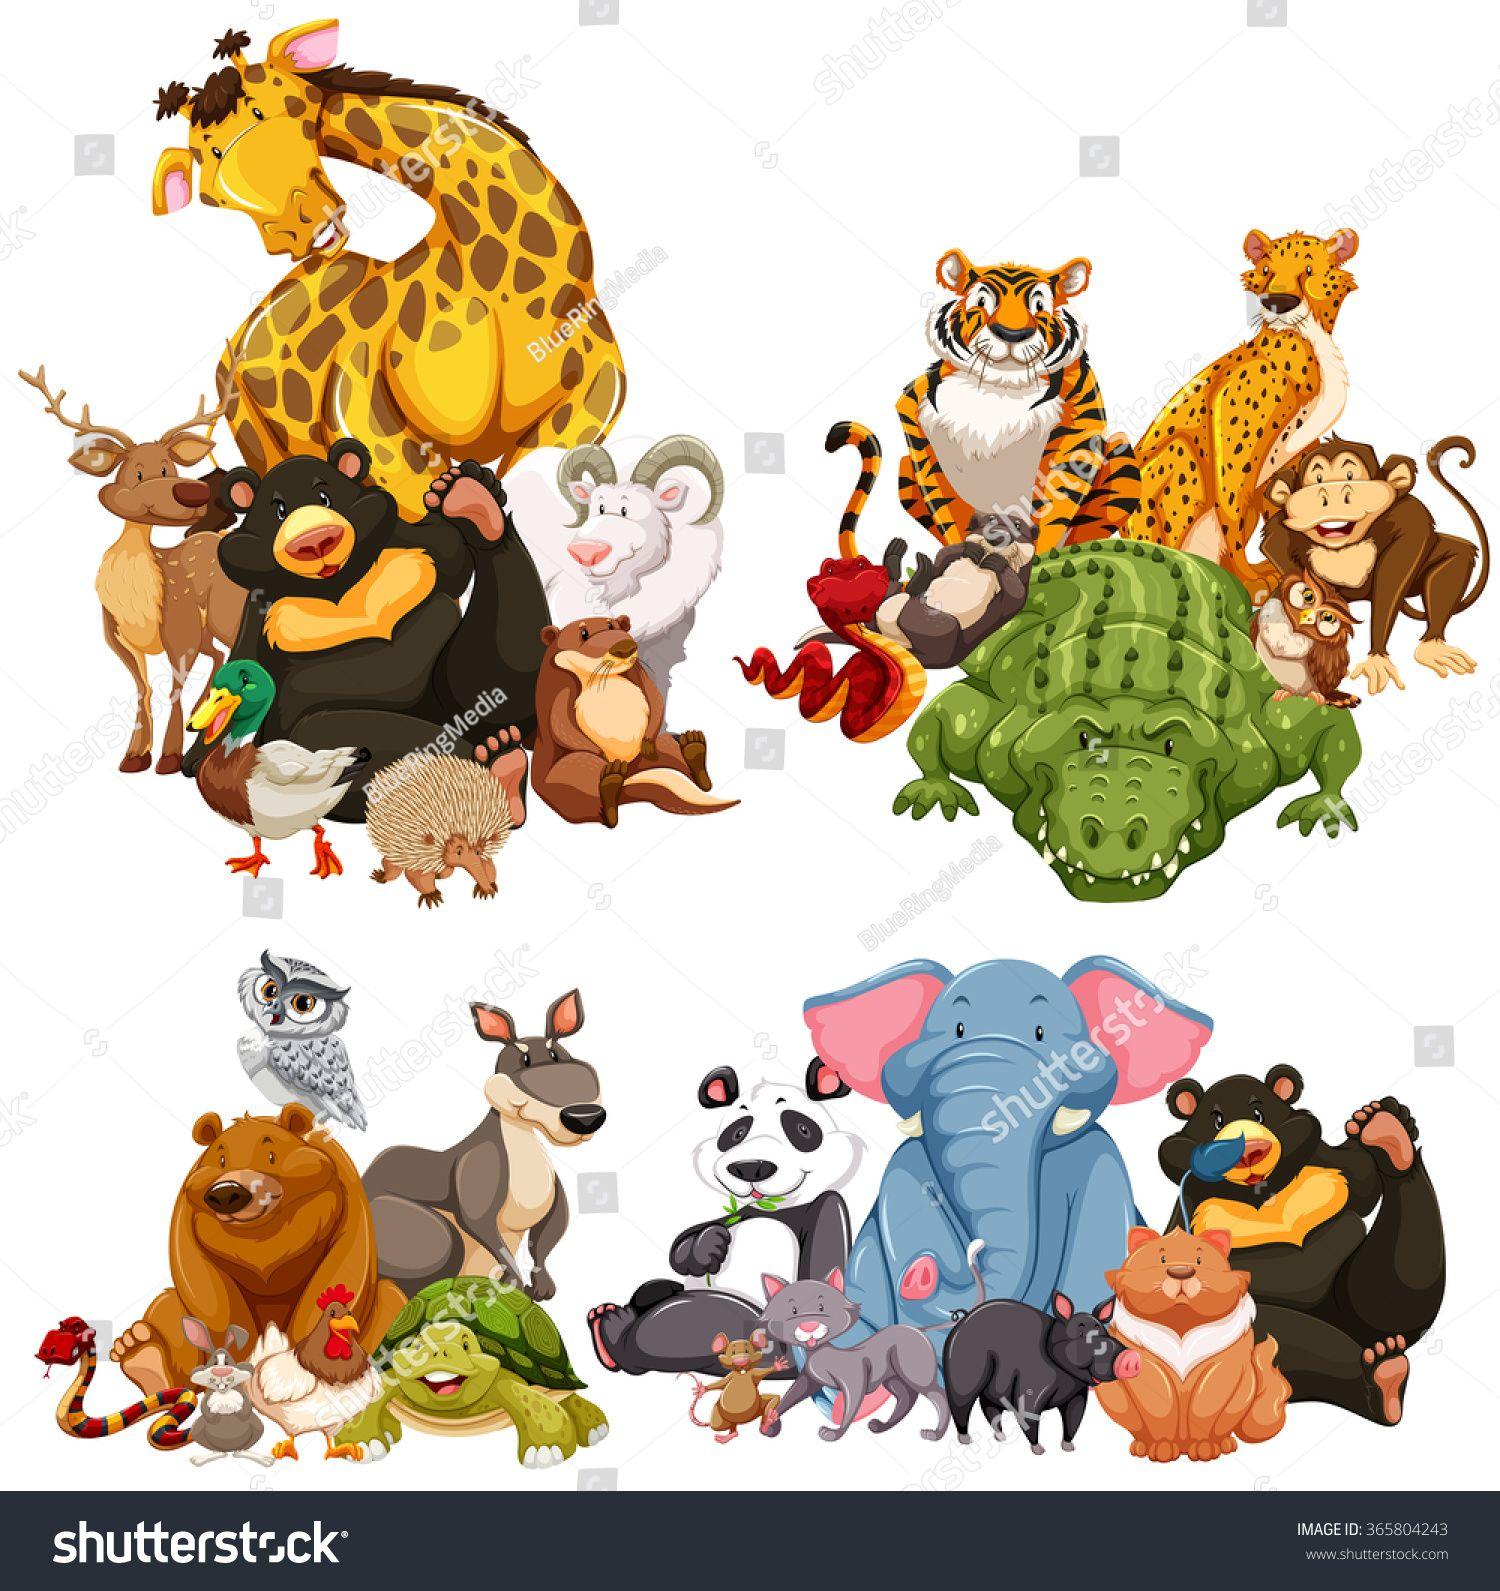 Four Group Of Wild Animals Illustration Ad Affiliate Wild Group Illustration Animals Animal Illustration Animals Wild Animals Artwork